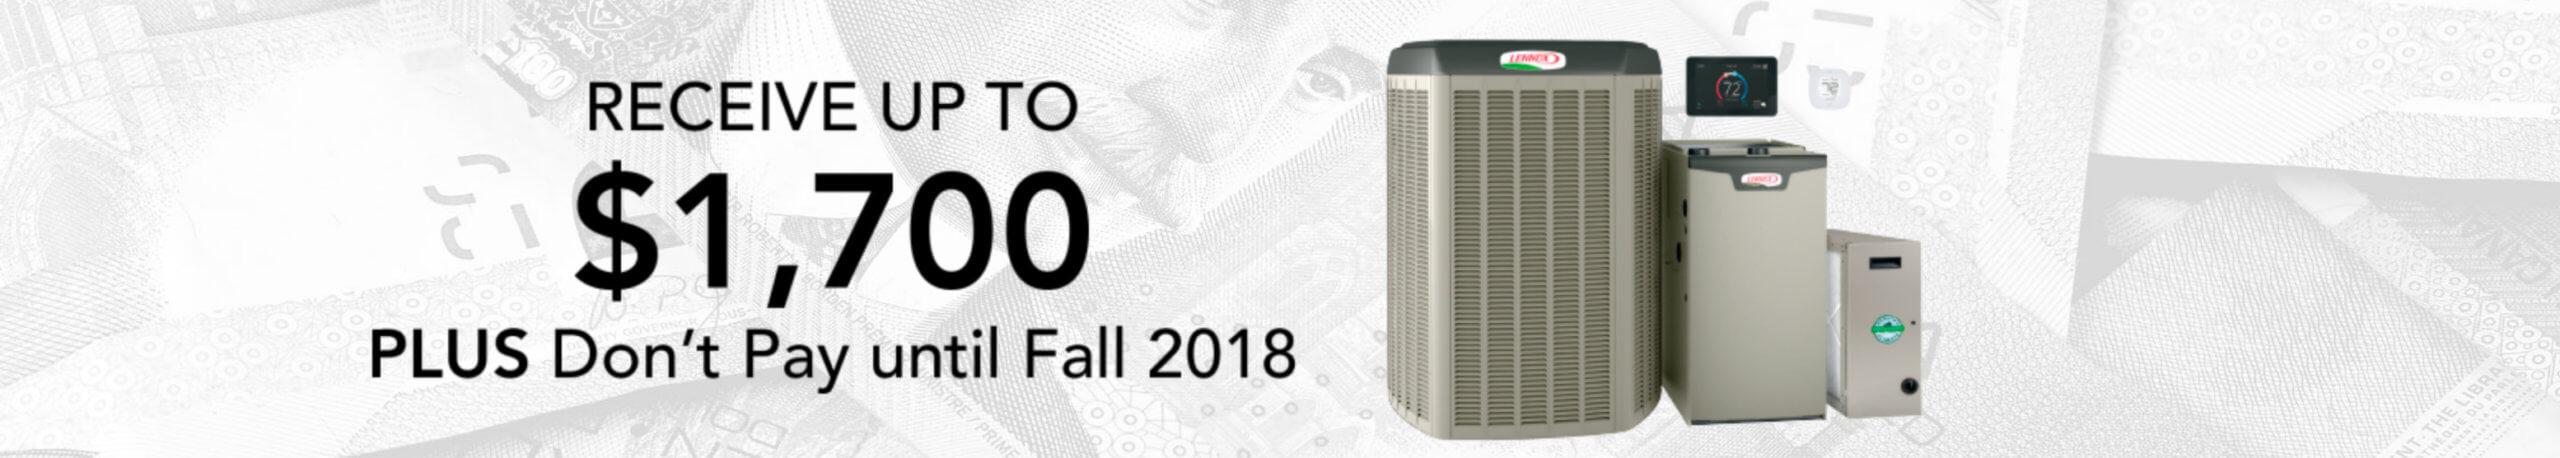 spring-rebate-2018